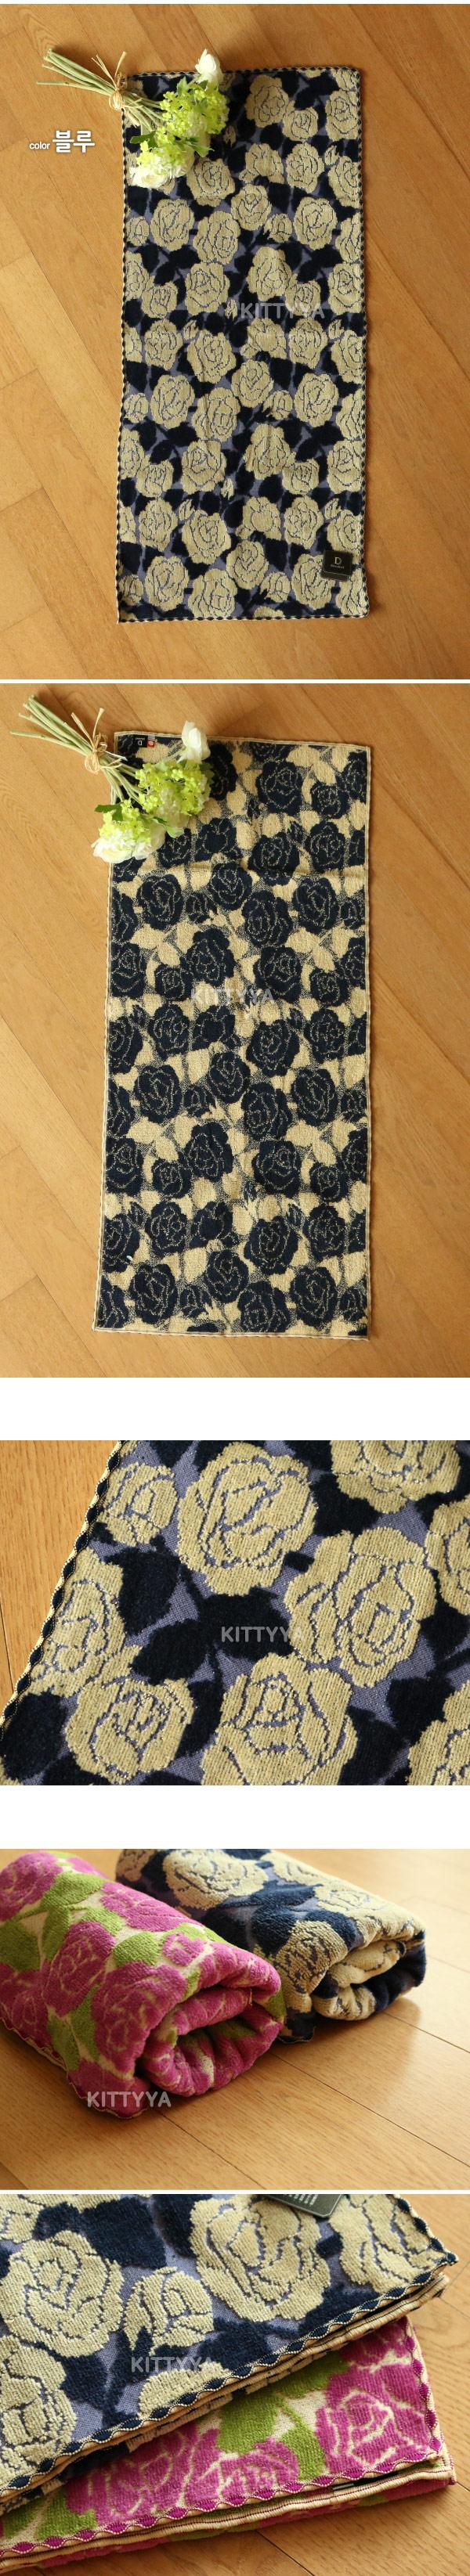 ETOILE 로즈 페이스 타올 (2color) - 키티야, 23,640원, 수건/타올, 바디타올